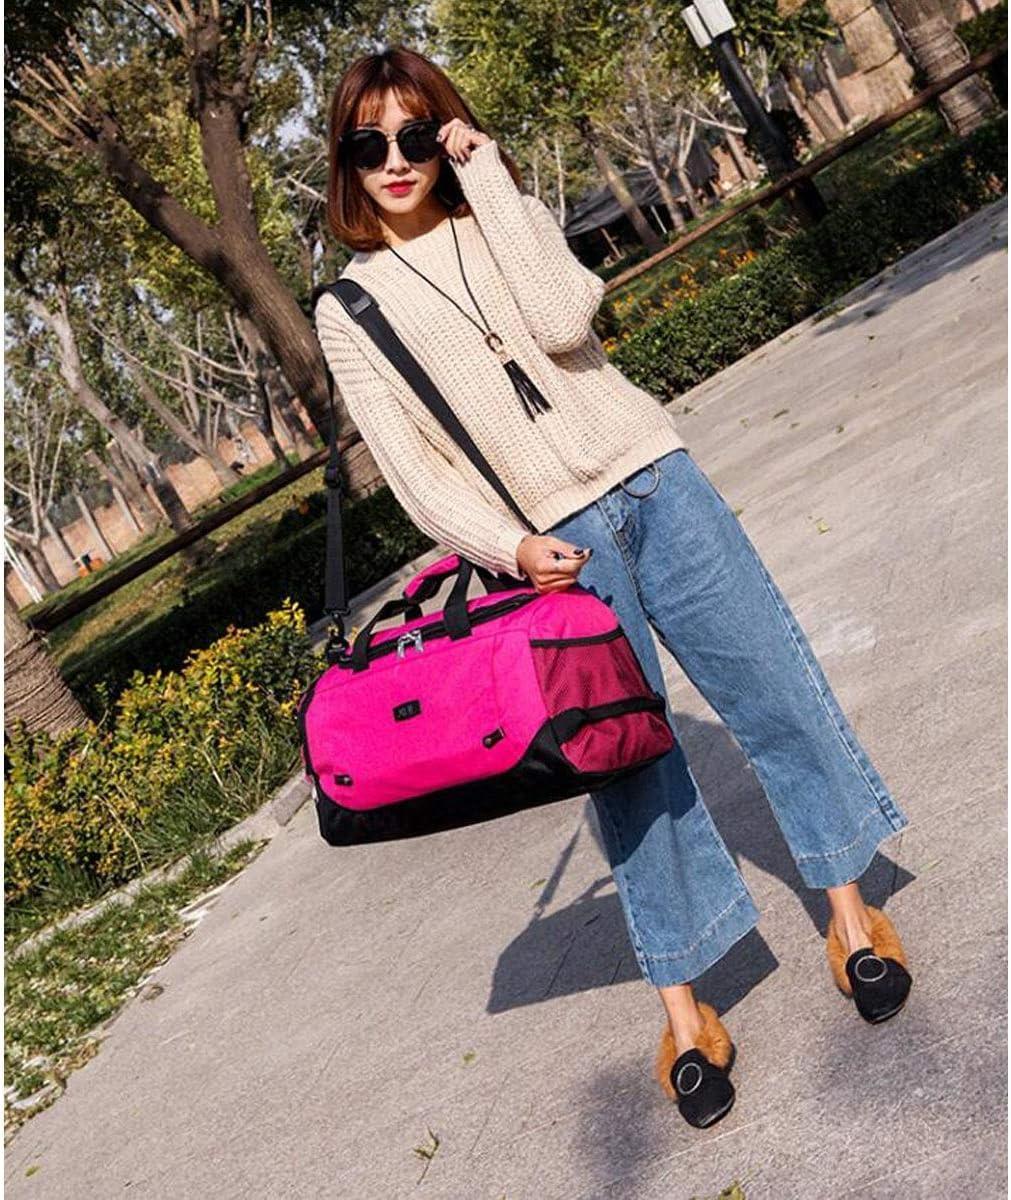 Kaiyitong Fitness Bag Large-Capacity Portable Sports Bag Color : Hemp Black Short-Distance Travel Bag Purple Size: 512327